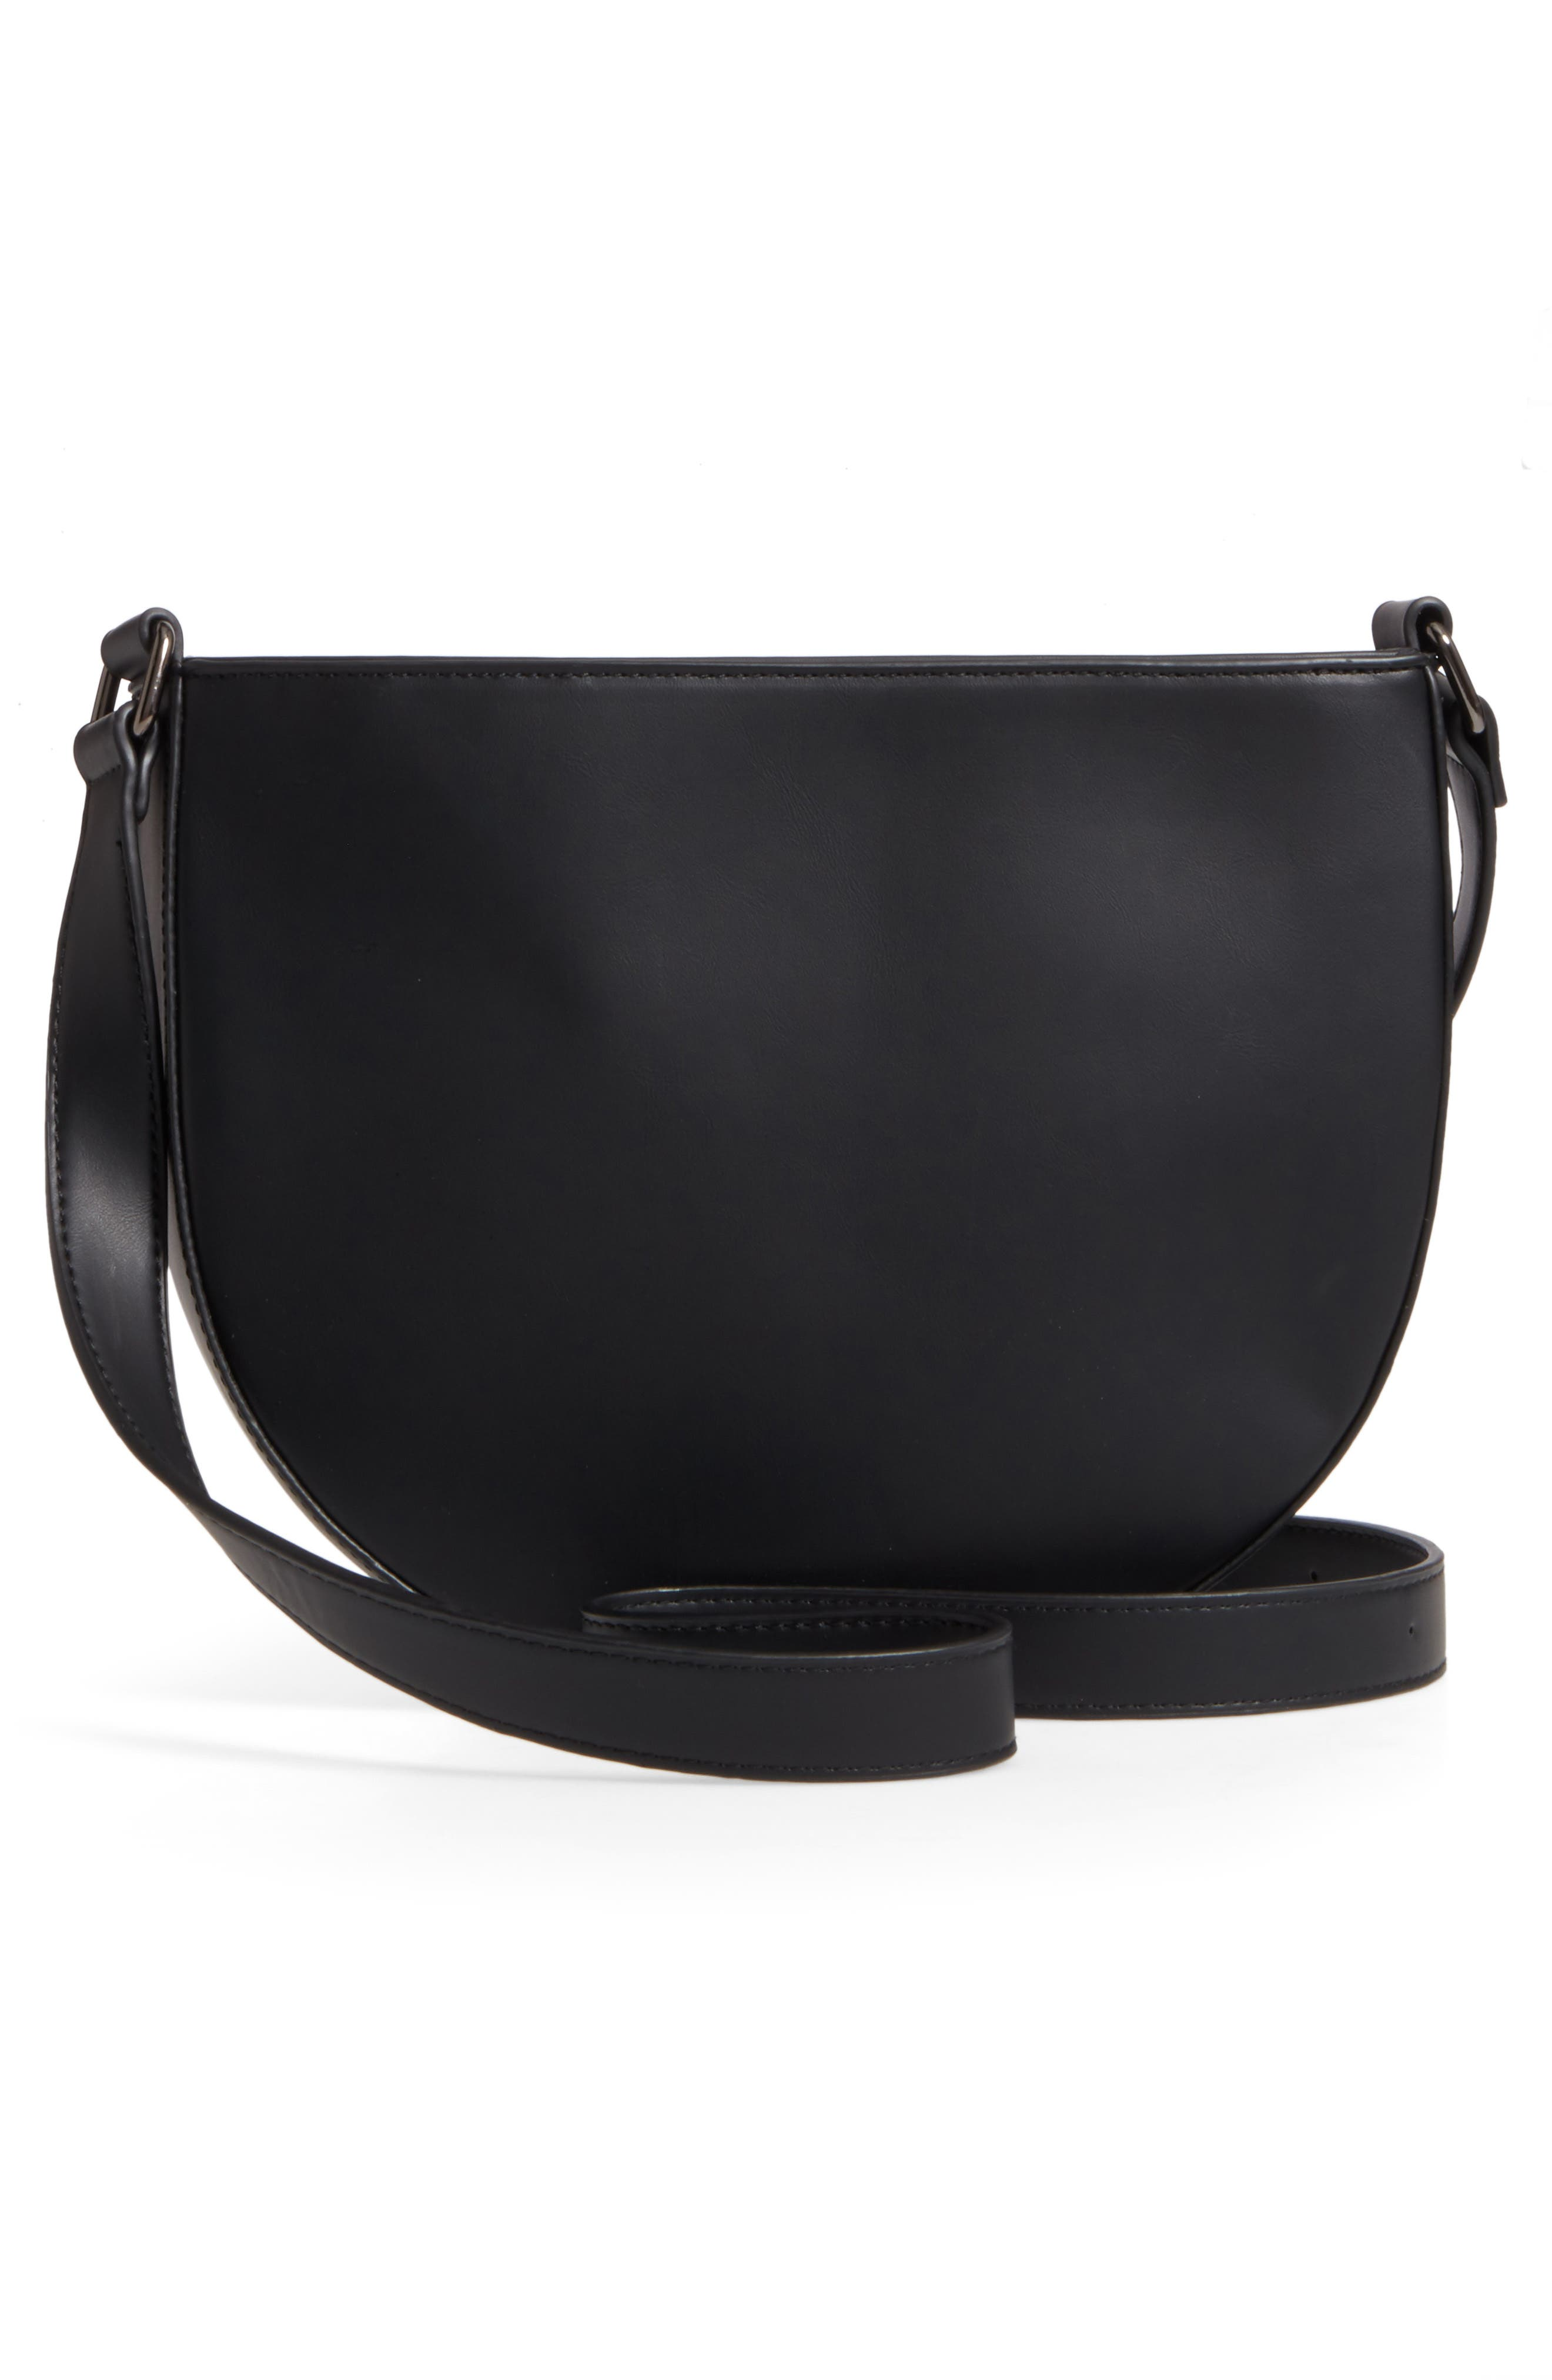 Half Moon Faux Leather Crossbody Bag,                             Alternate thumbnail 3, color,                             001